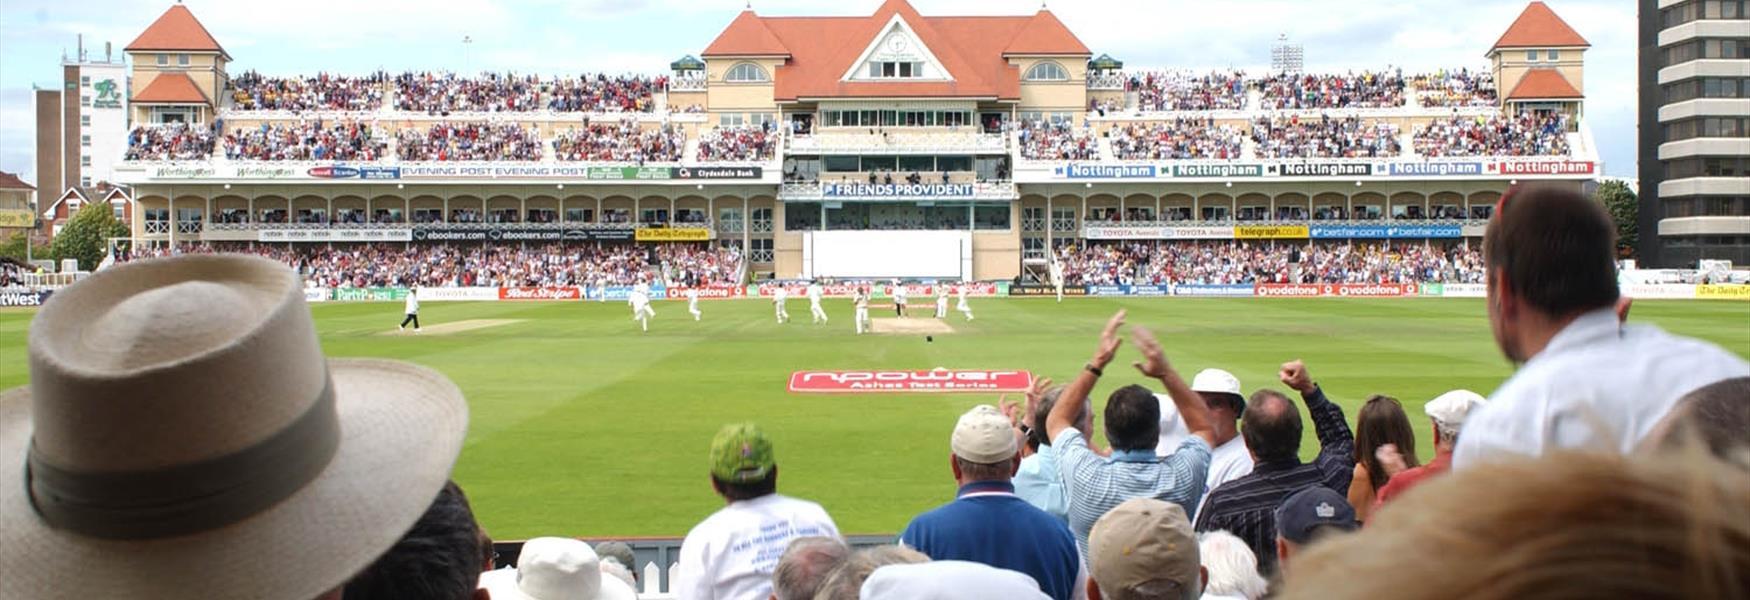 Trent Bridge, Nottinghamshire Country Cricket Club